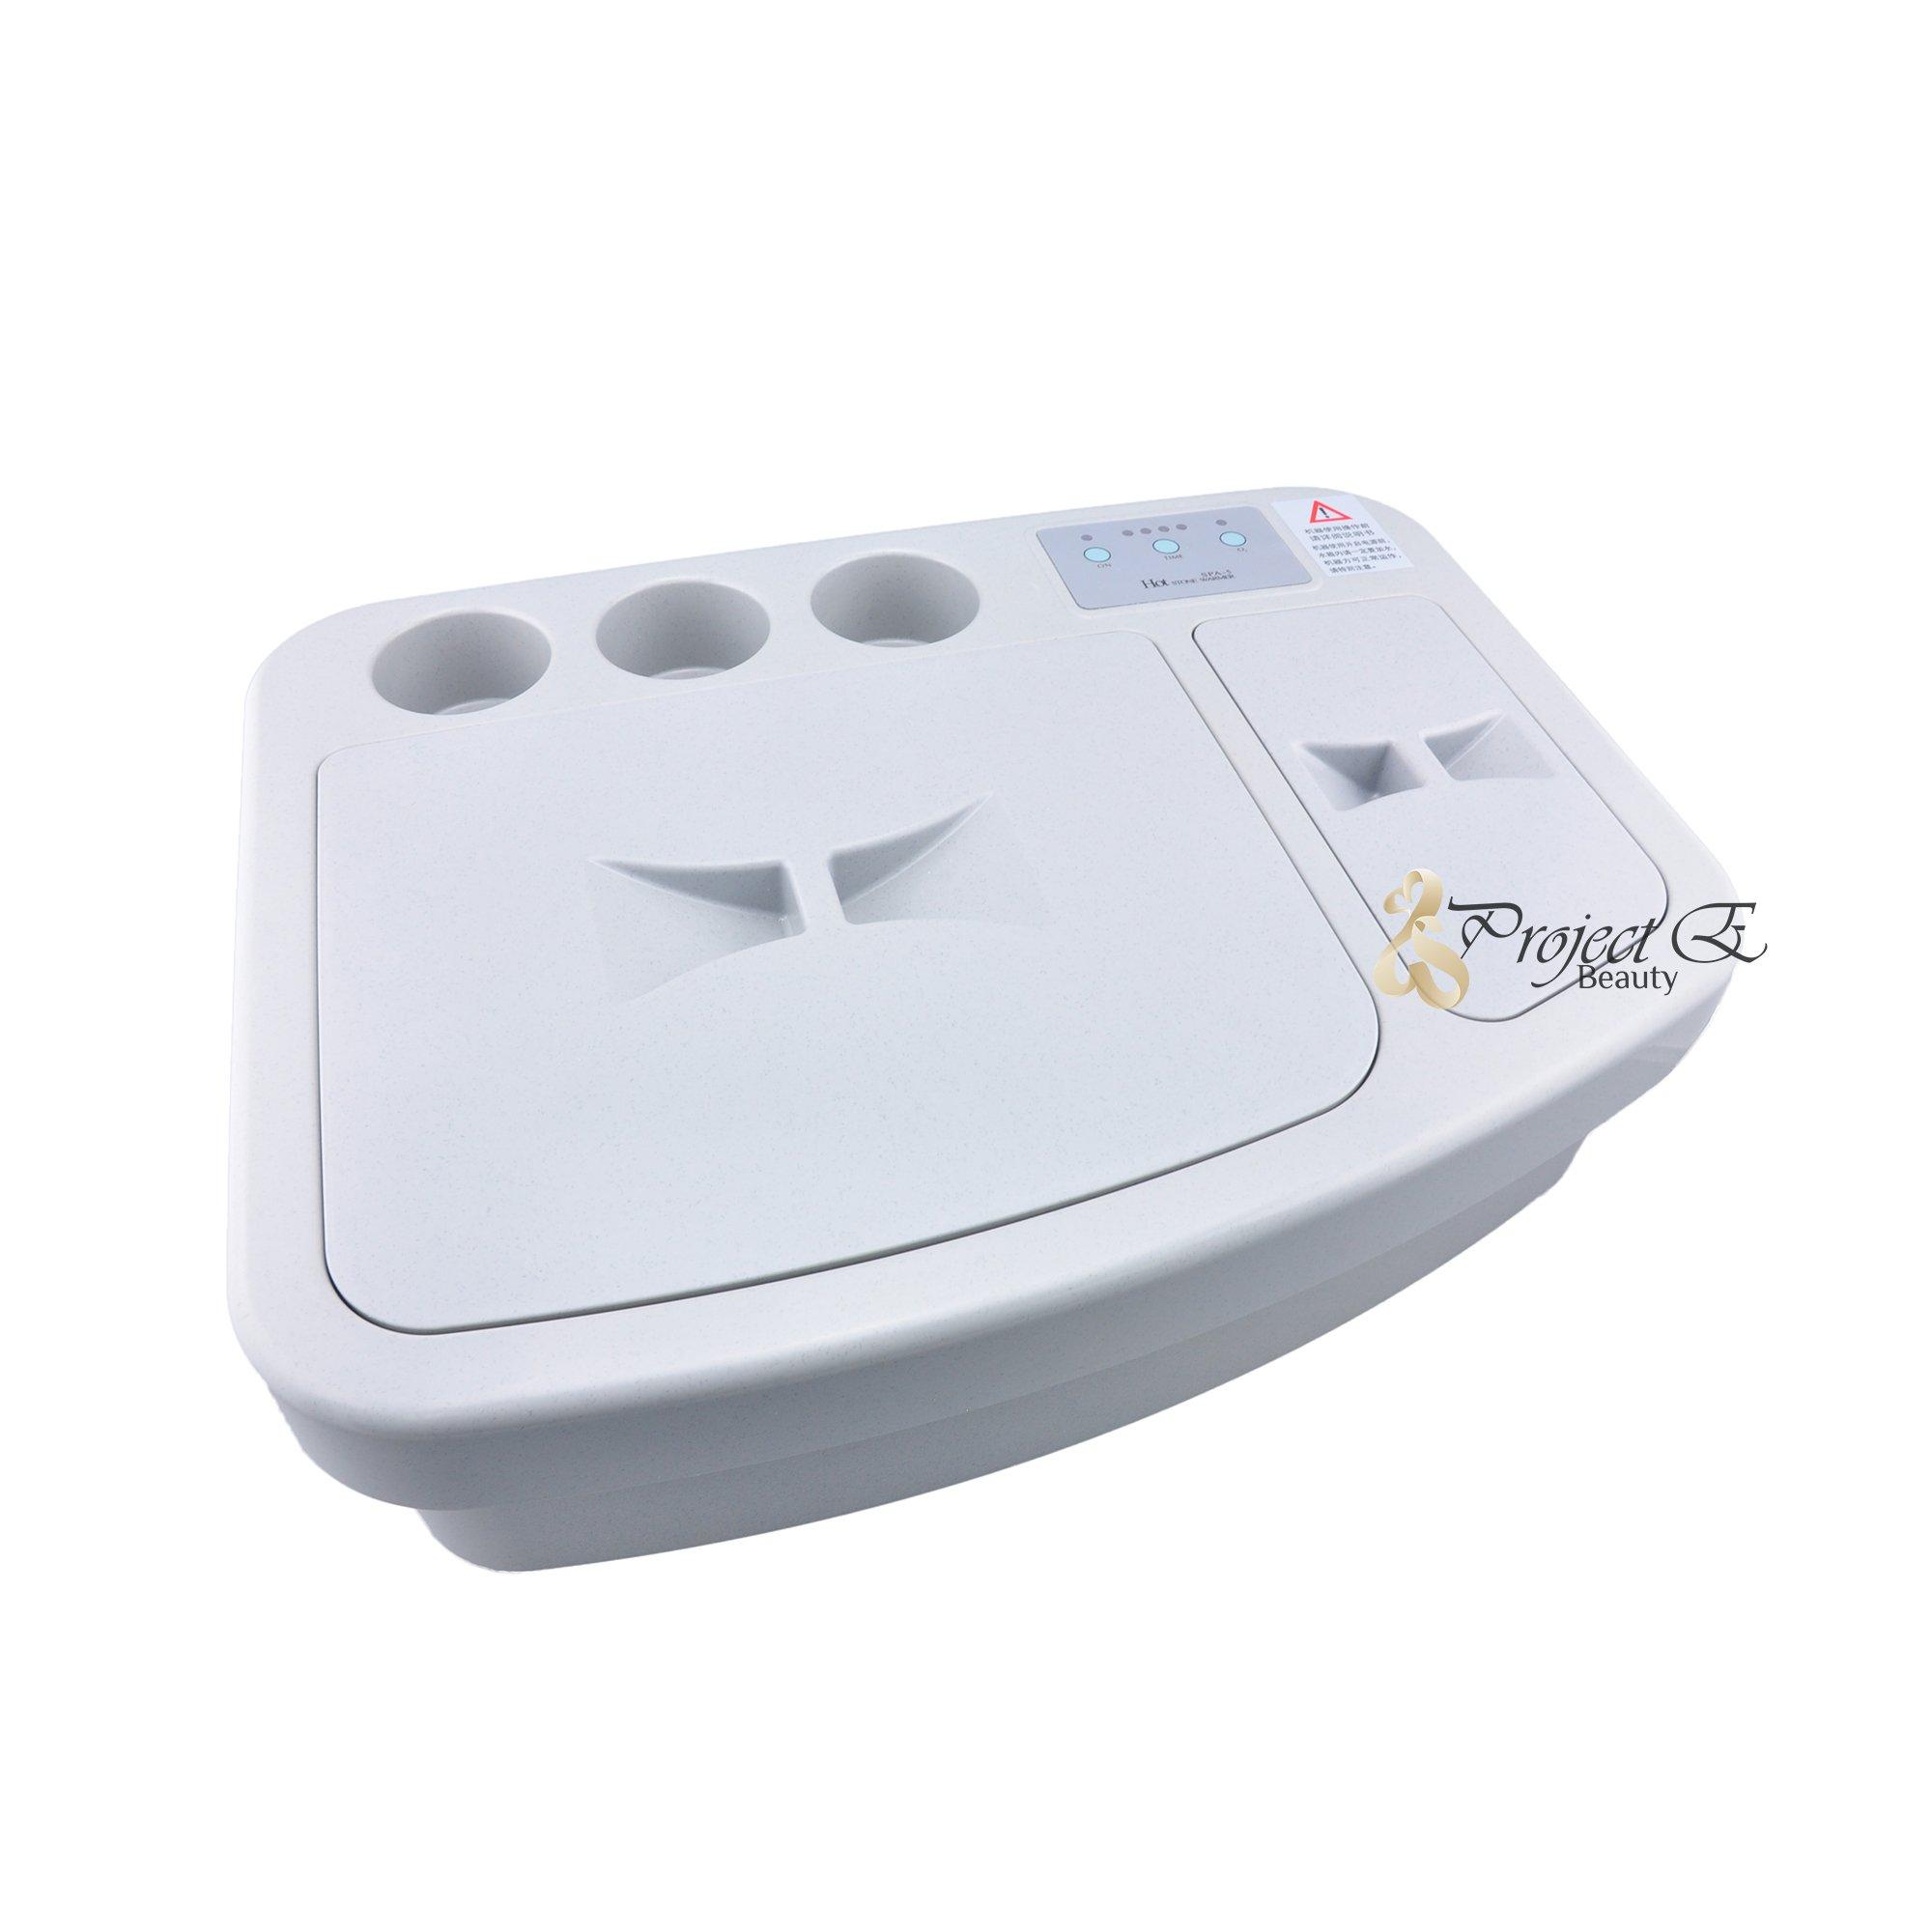 Project E Beauty New Ozone Hot Warm Stone Stones Rocks Massage Warmer Heater Spa Salon Use